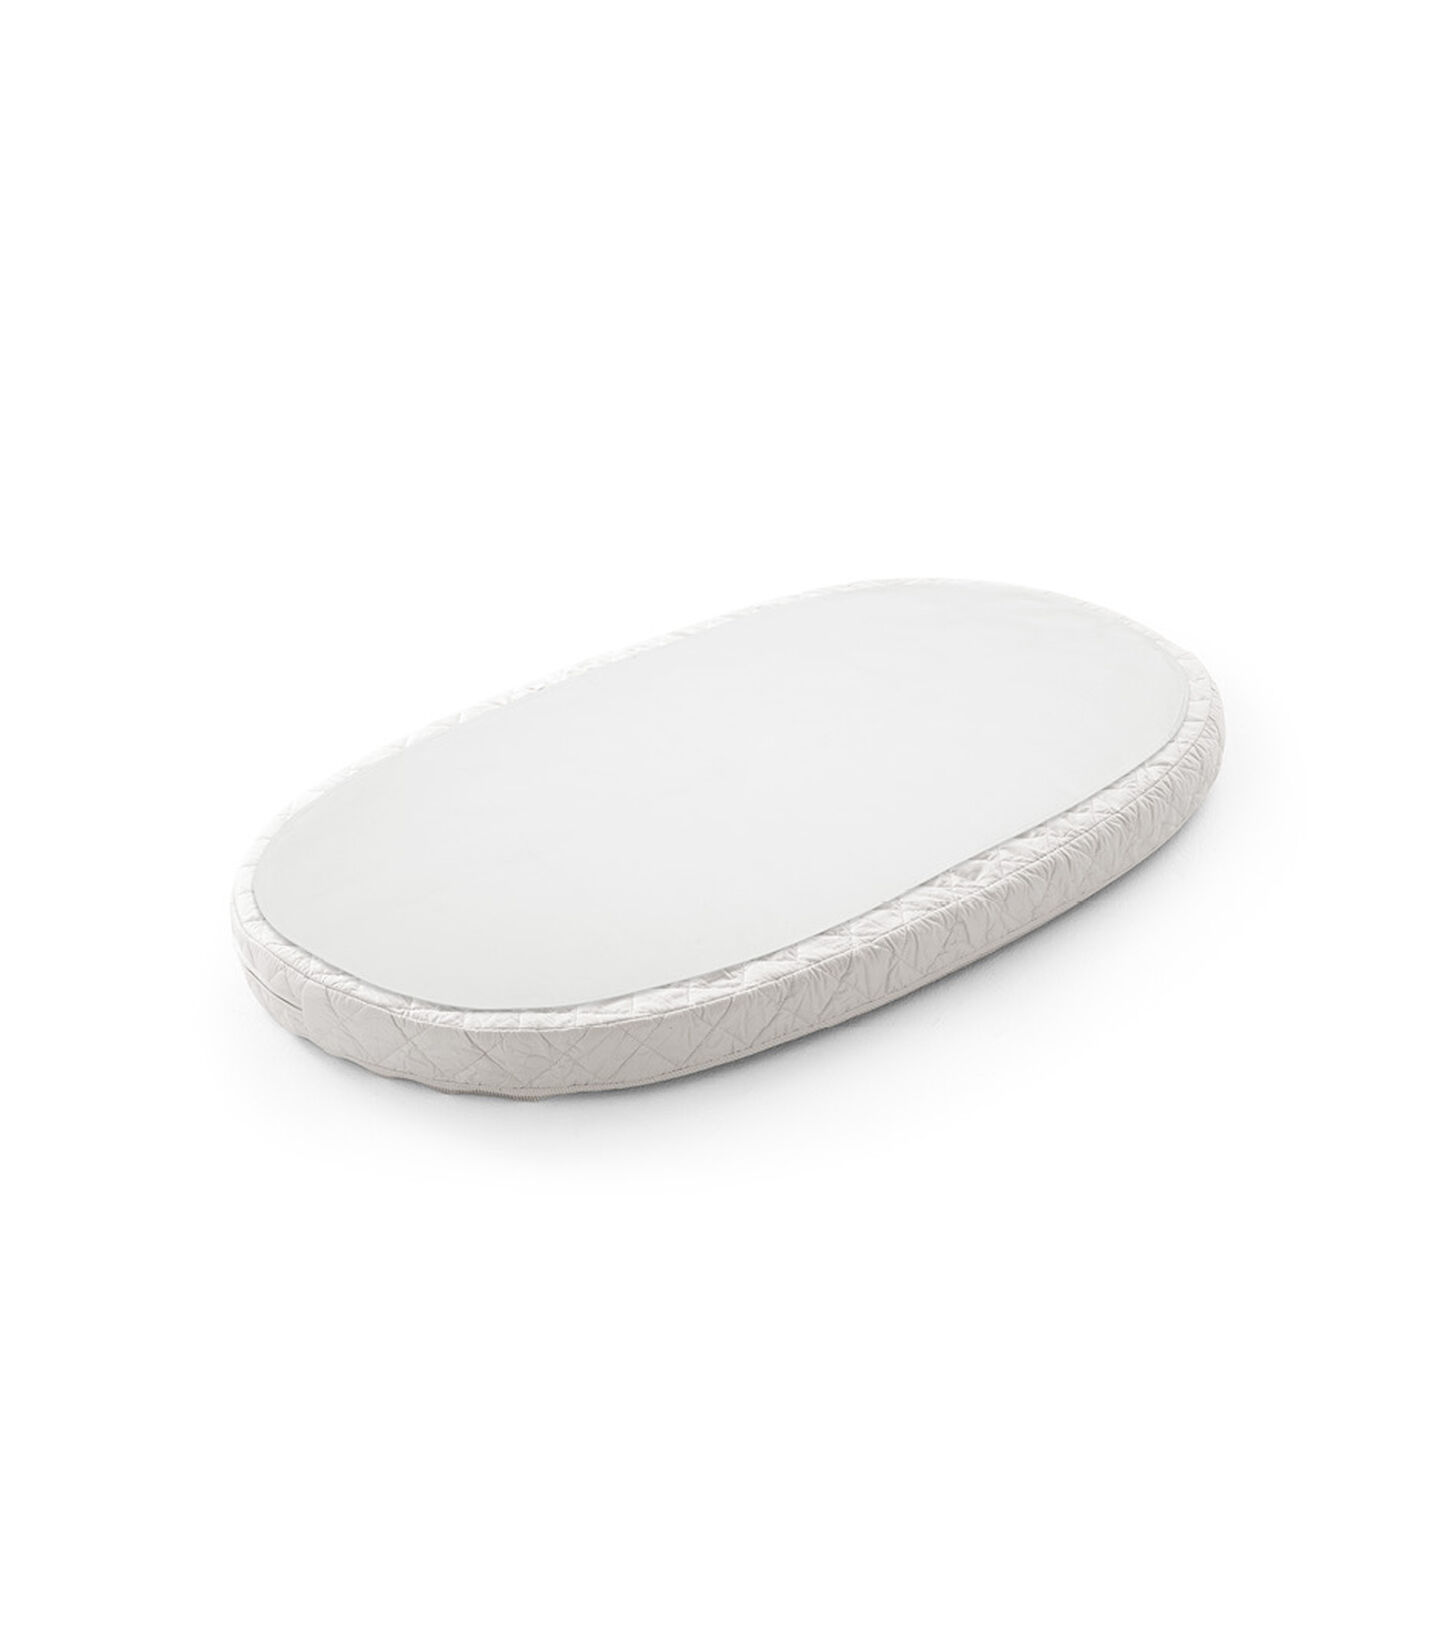 Stokke® Sleepi™ Beskyttelseslagen ovalt, , mainview view 1